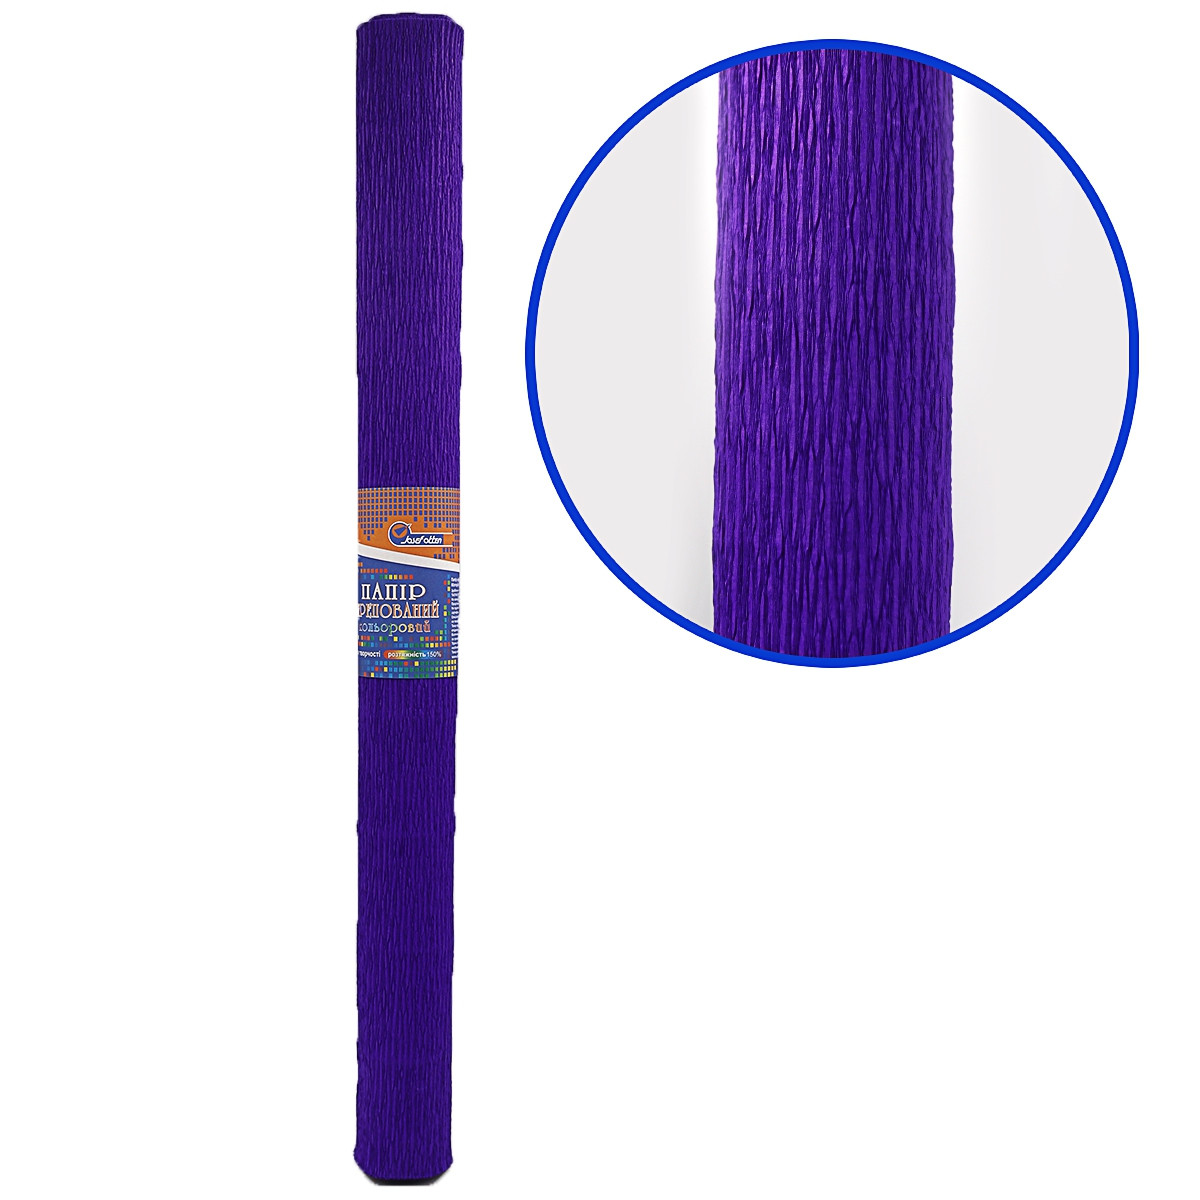 Креп-бумага 150%, темно-фиолетовый 50*200см, 1pc/OPP, осн.95г/м2, общ.238г/м2